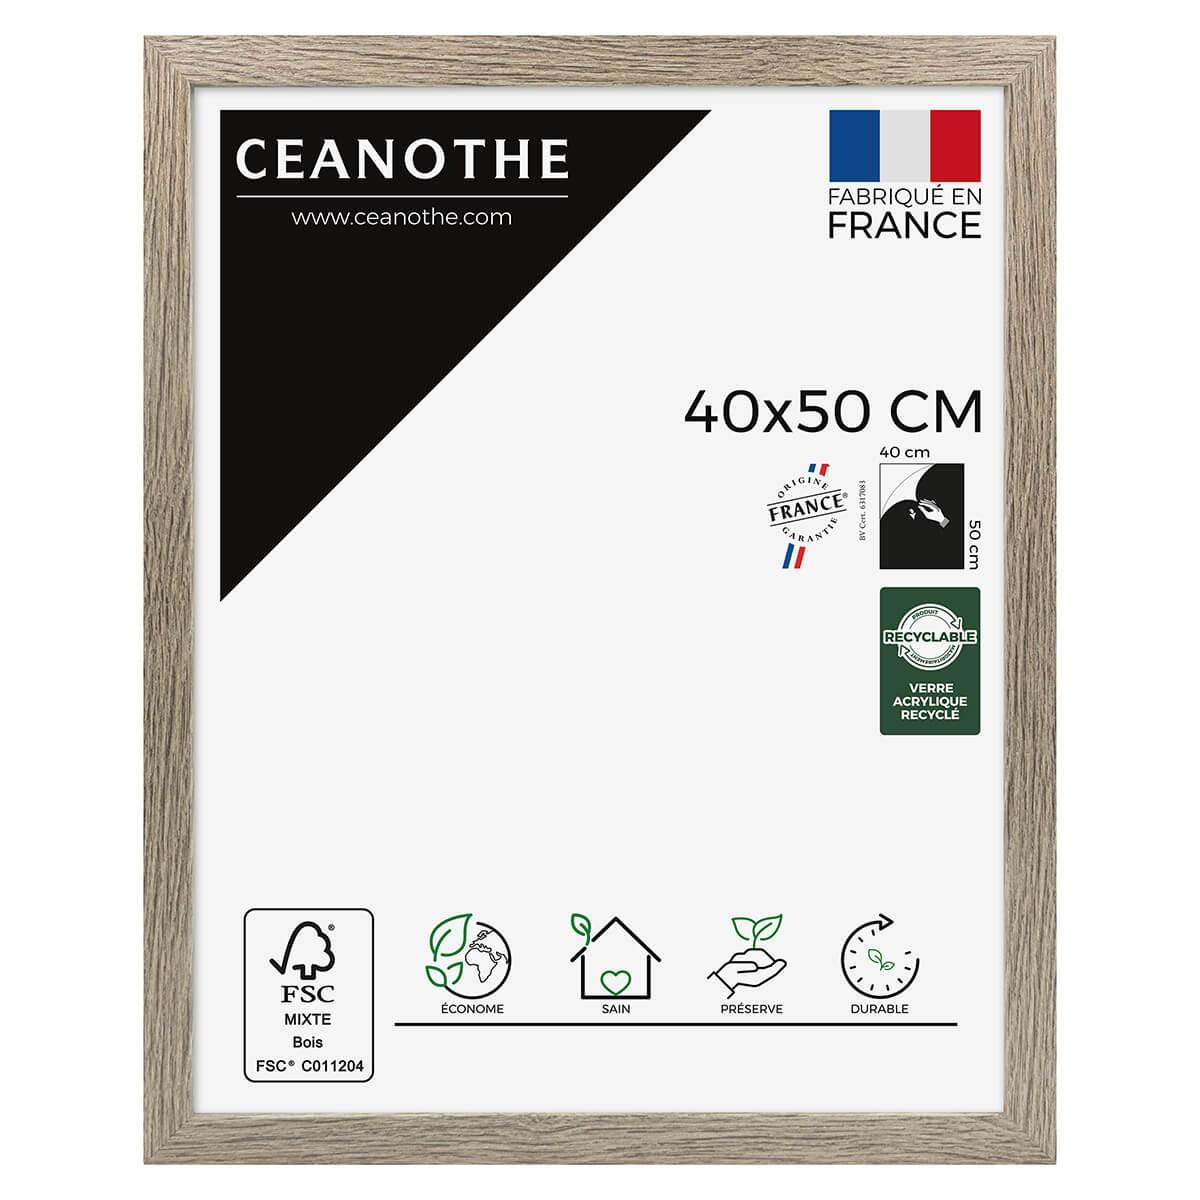 Cadre photo Nordique taupe 40x50 cm